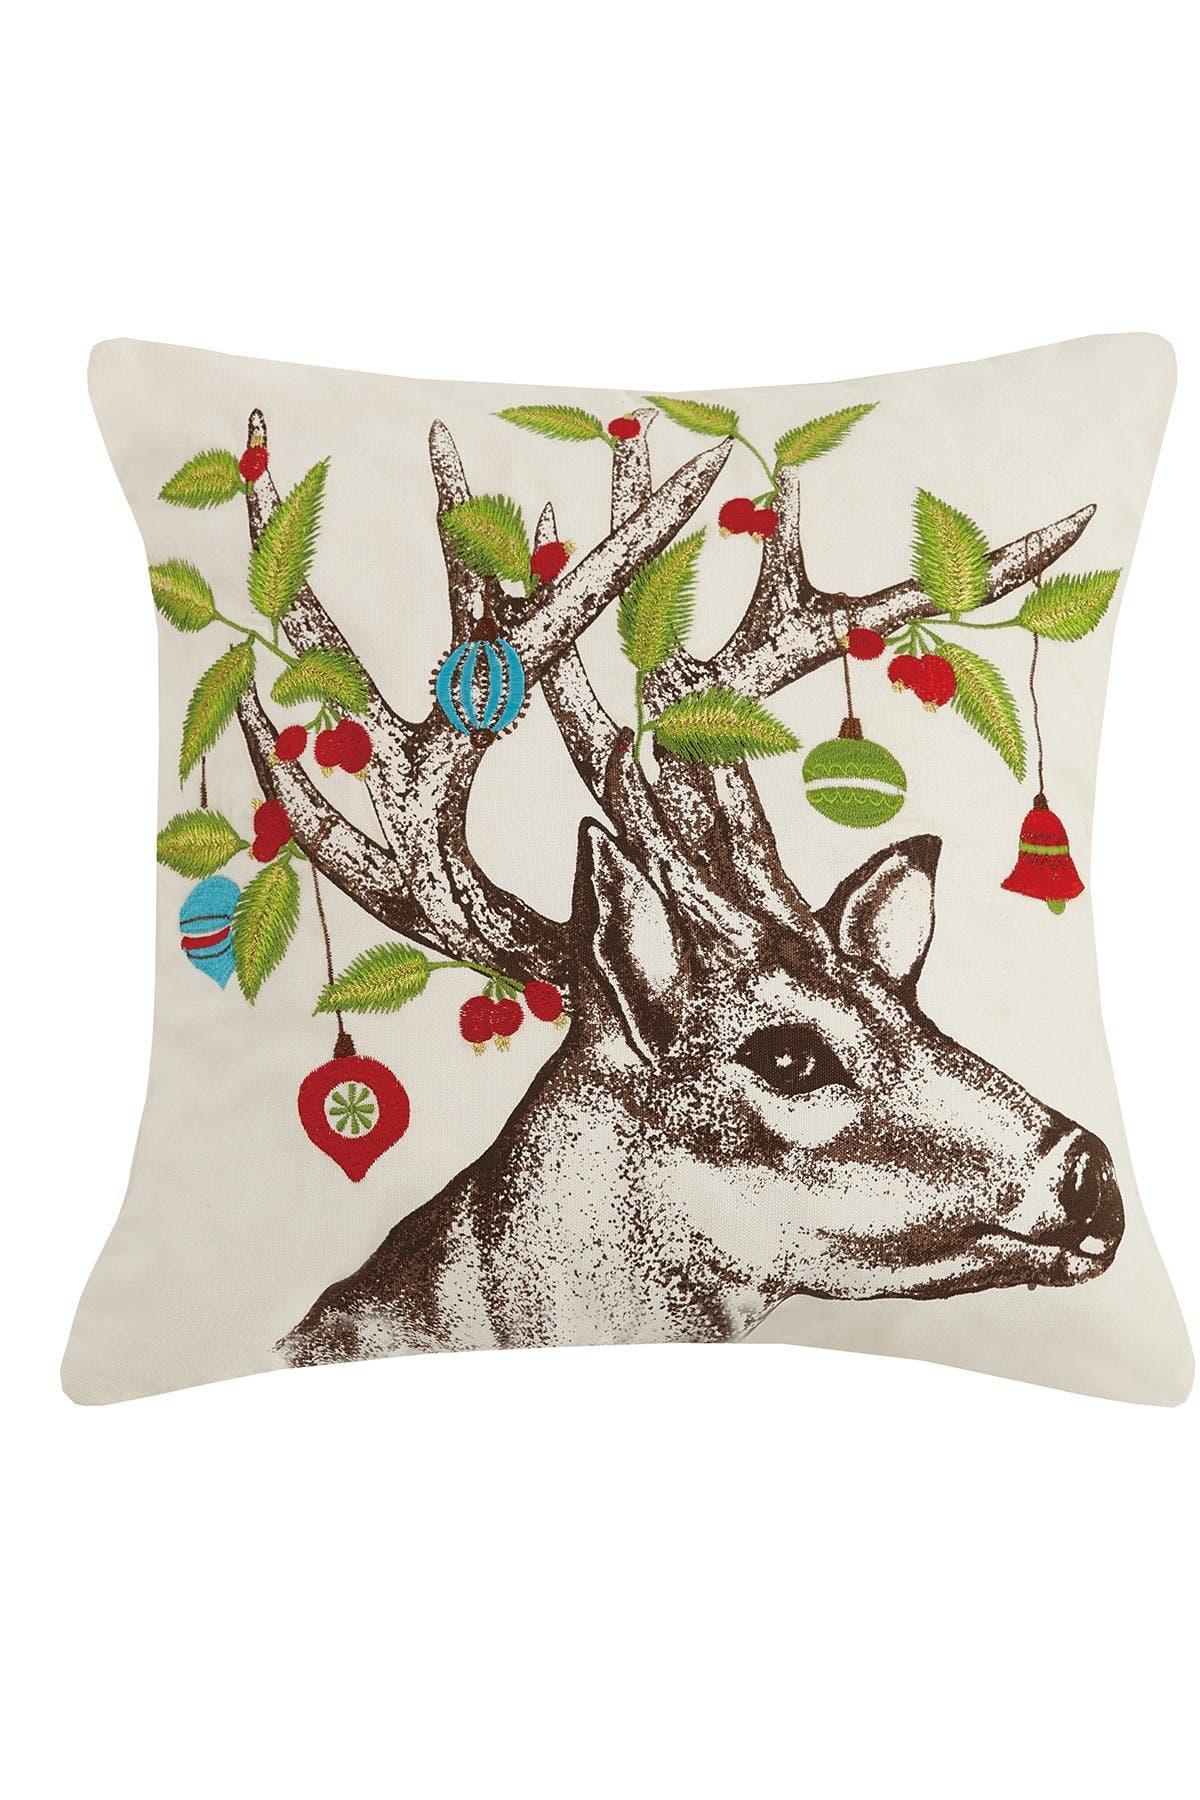 Image of Peking Handicraft Multi Deer Ornament Embroidered Pillow